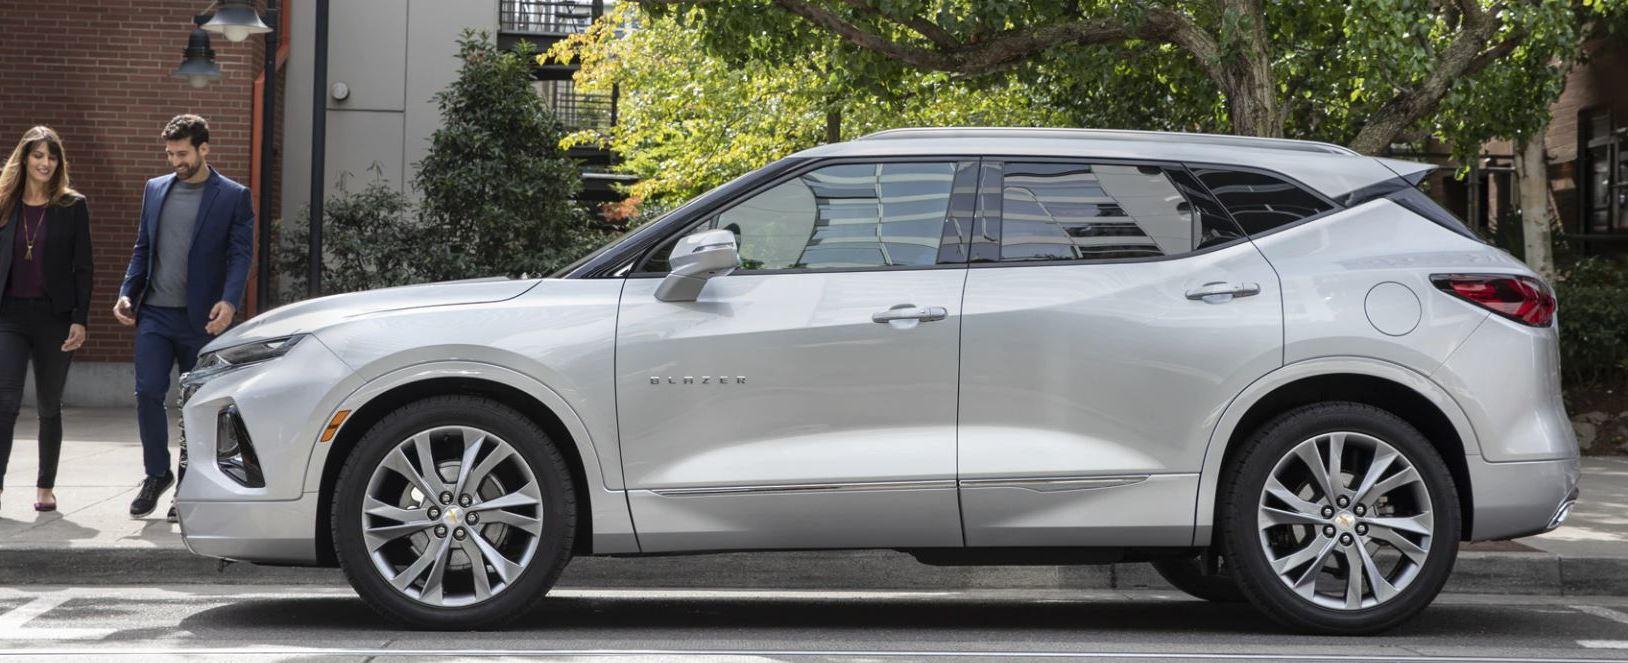 2020 Chevrolet Blazer Leasing near Lansing, MI